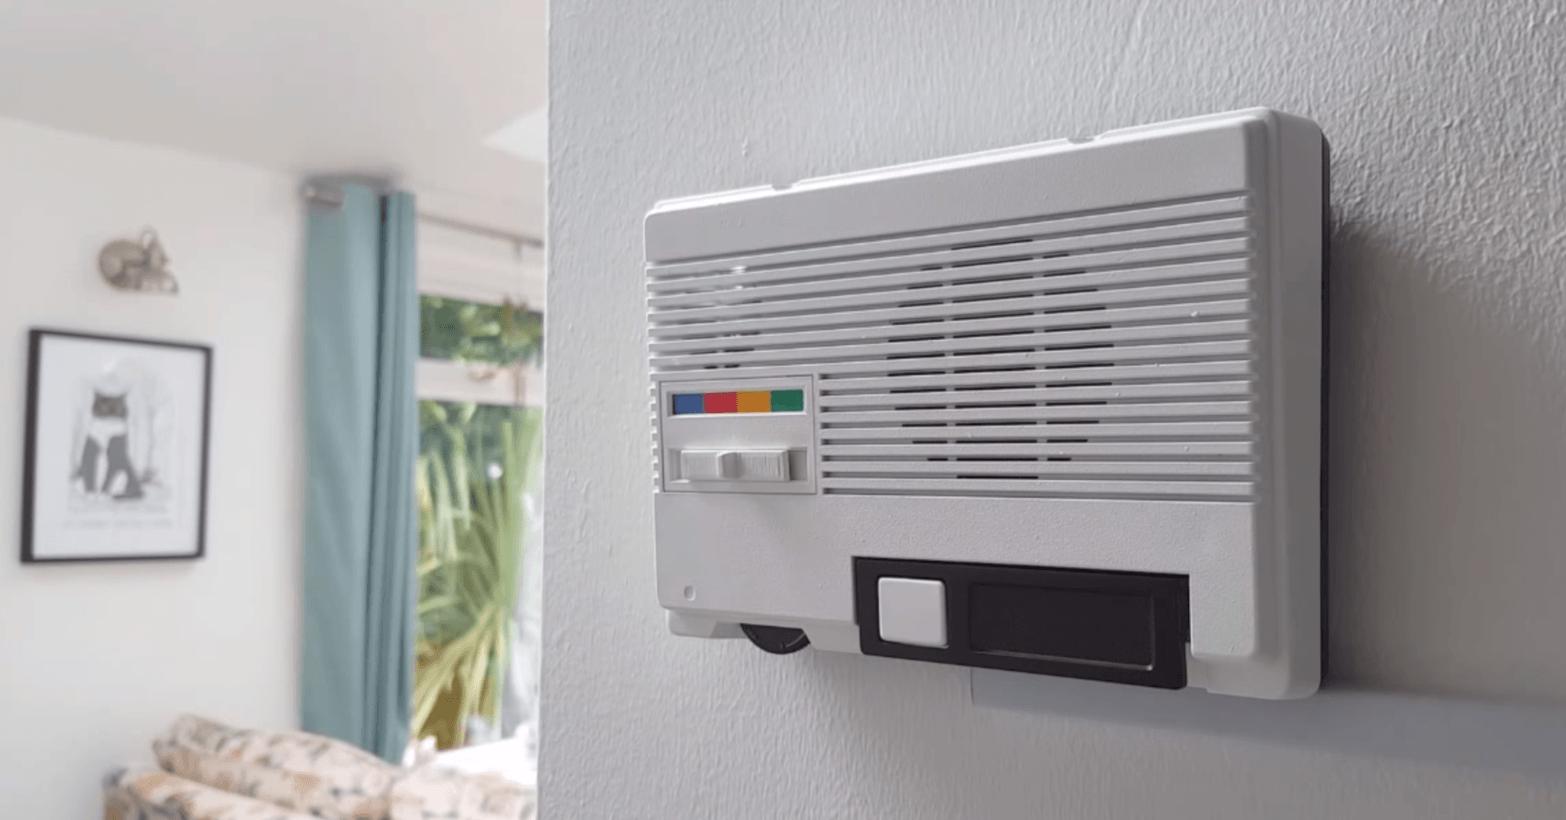 Oldschool intercom gets Raspberry Pi upgrade to turn into Google Home